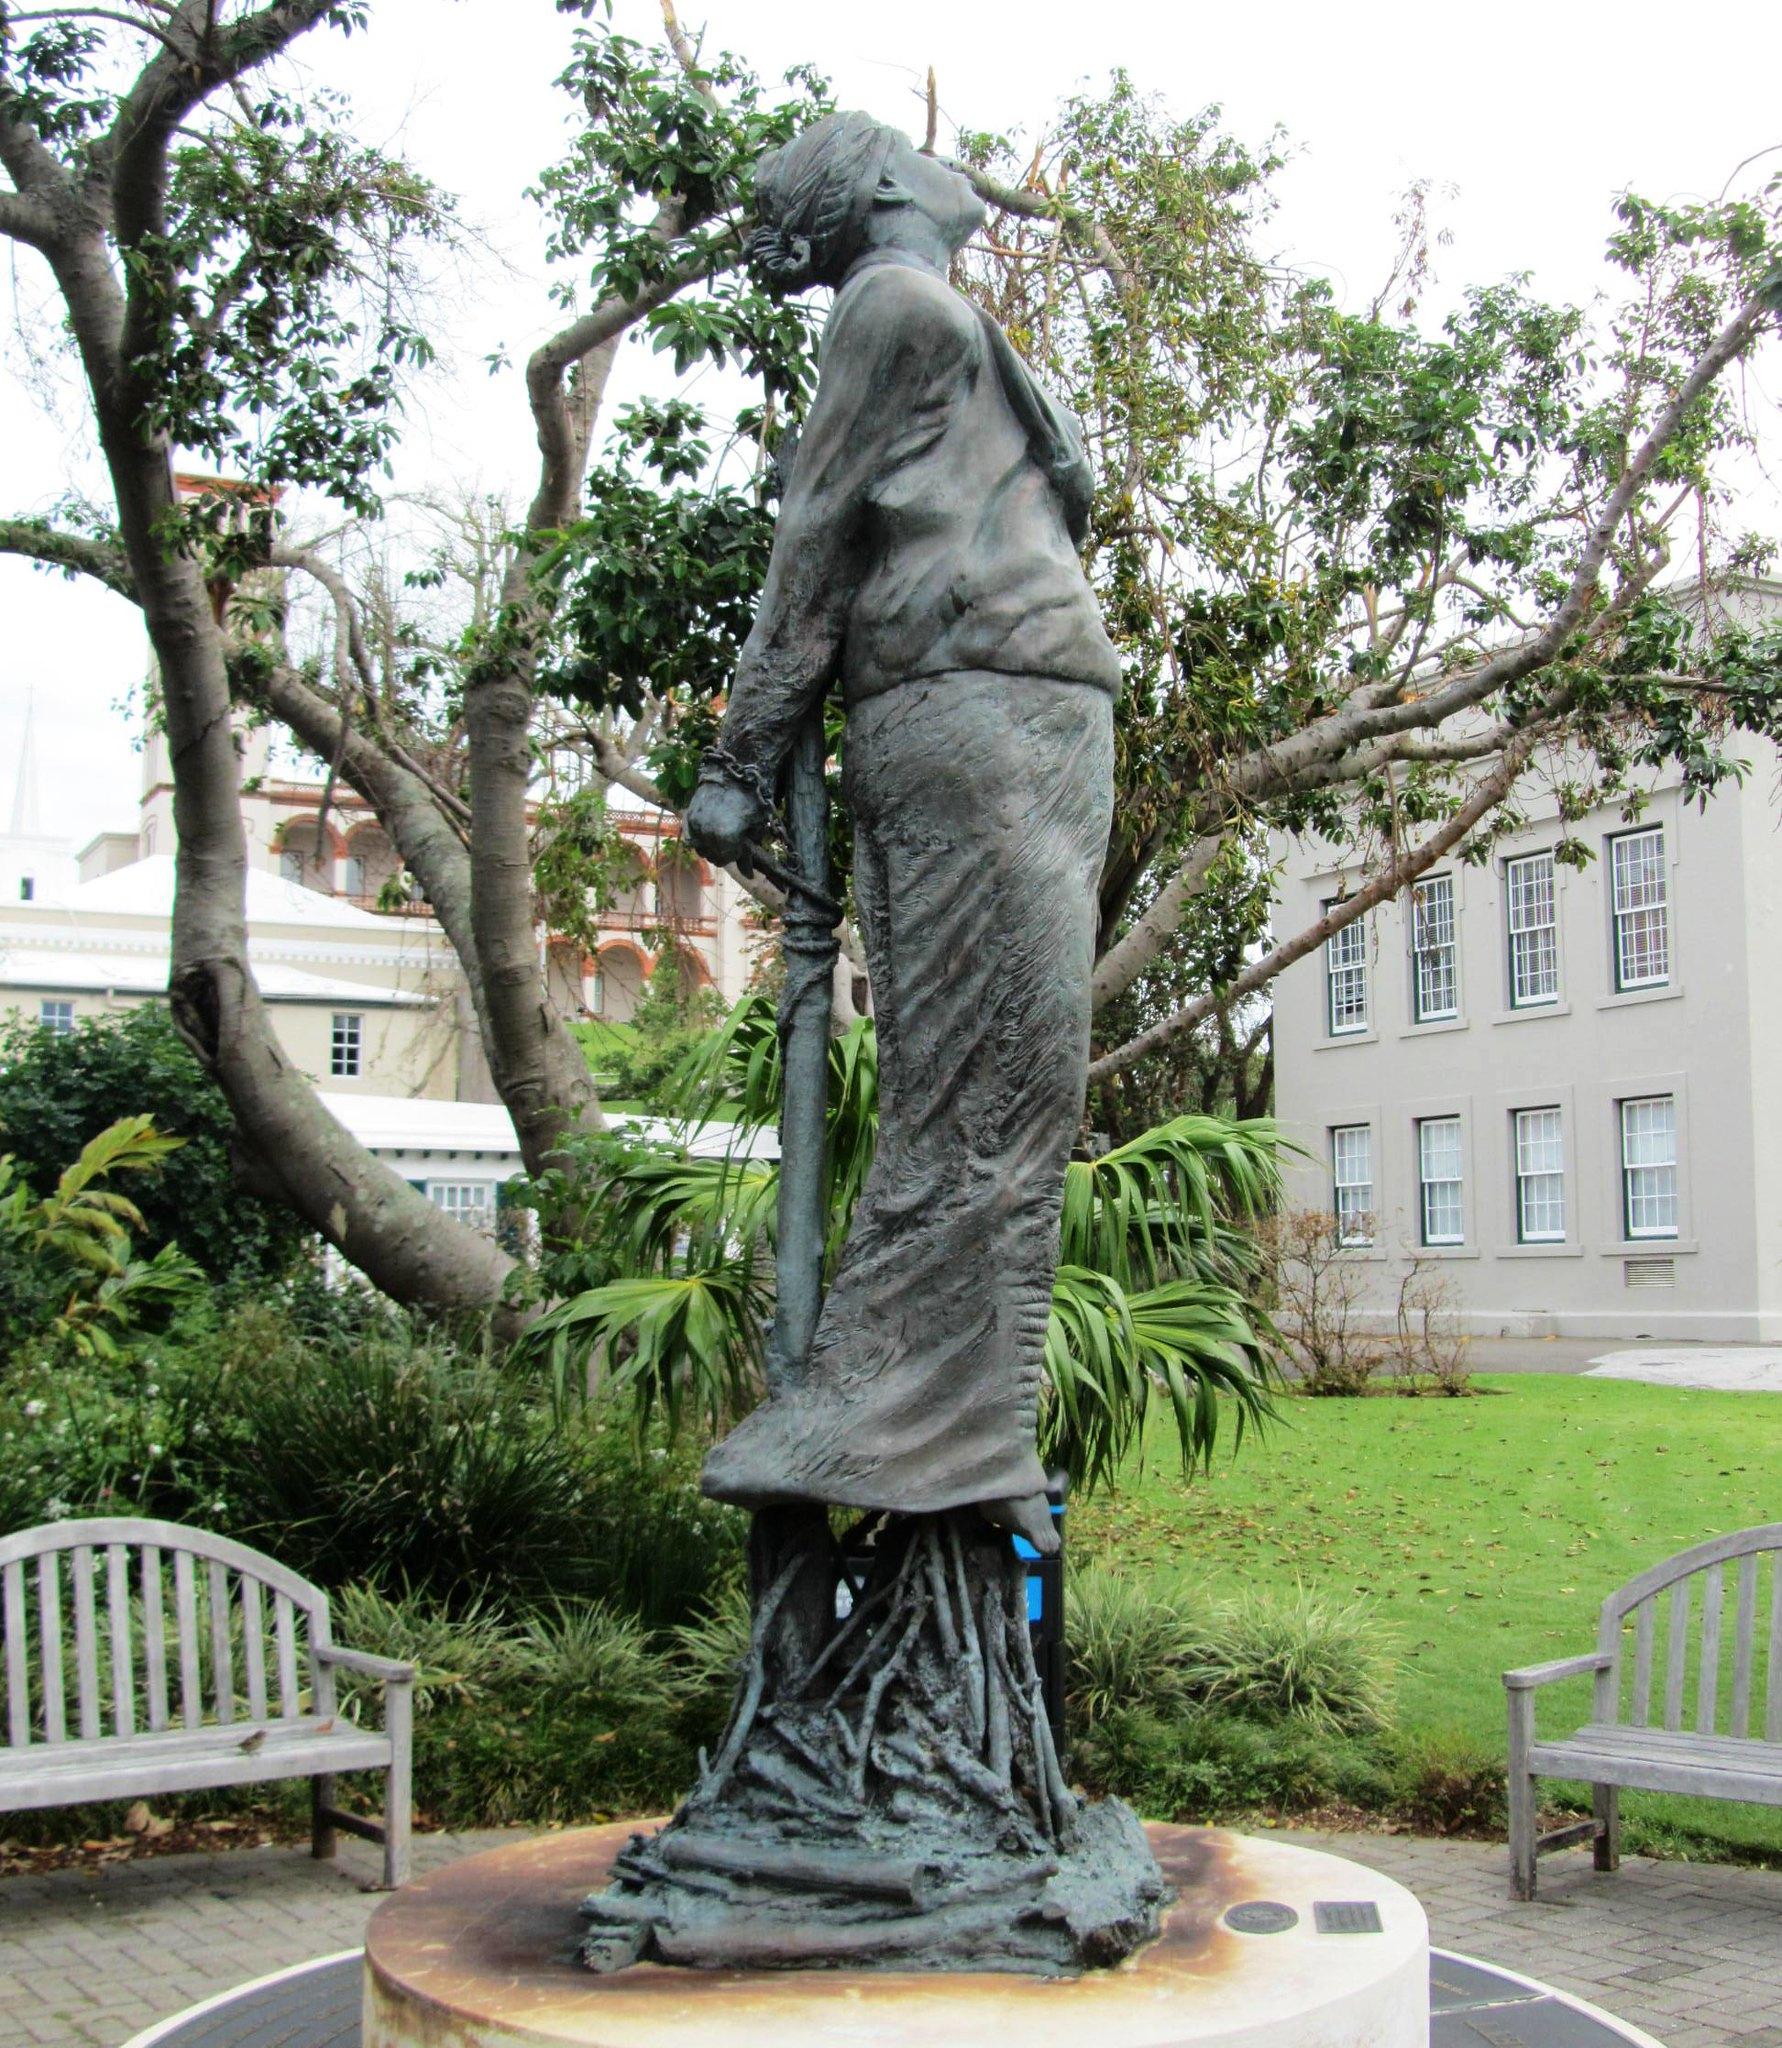 Bermuda. Hamilton. A bronze of Sarah (Sally) Bassett. Read her story below.